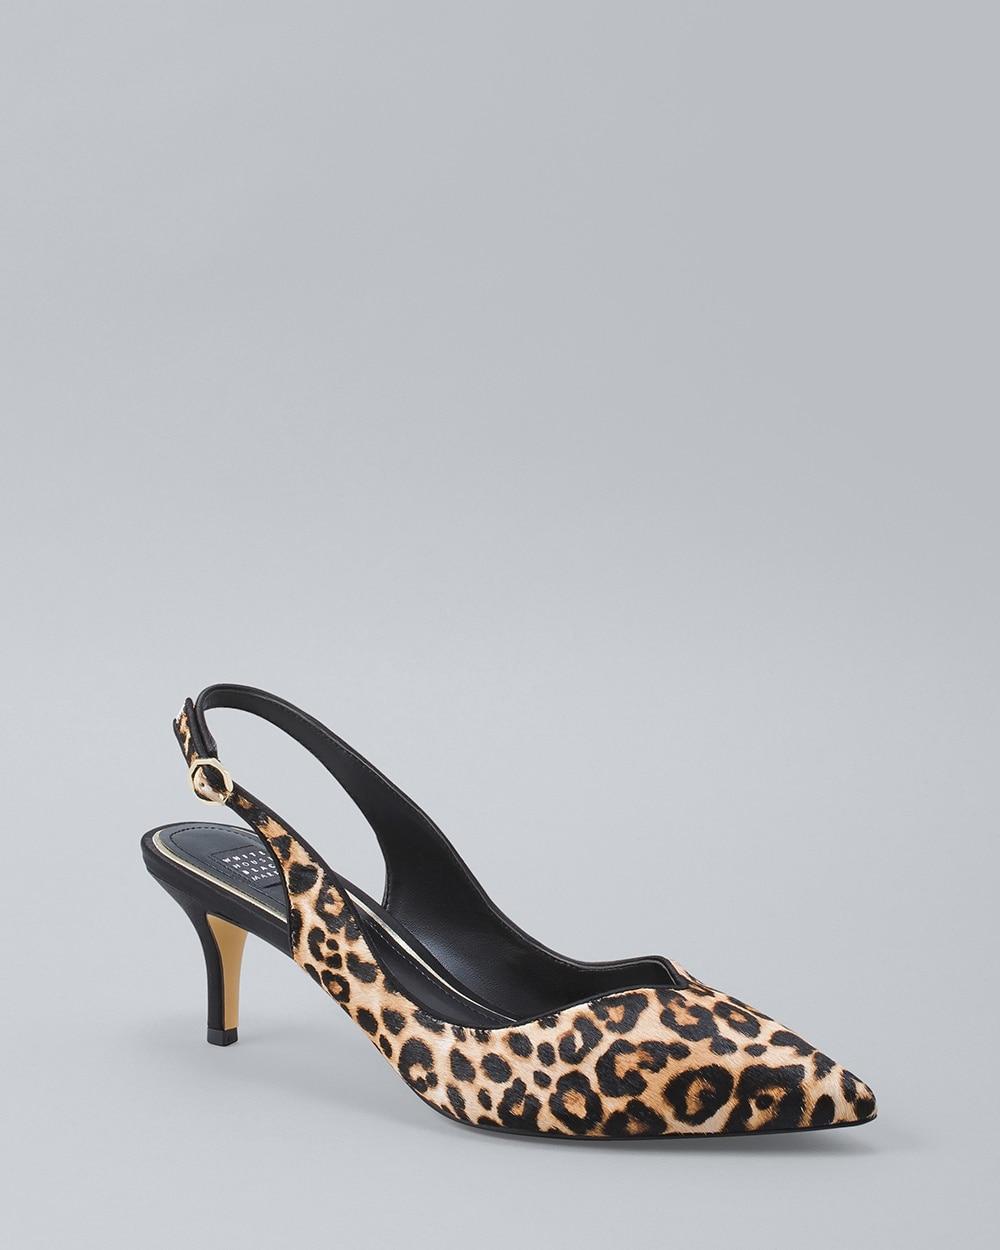 45de645a95b5 Leopard Calf Hair Slingback Heels - White House Black Market